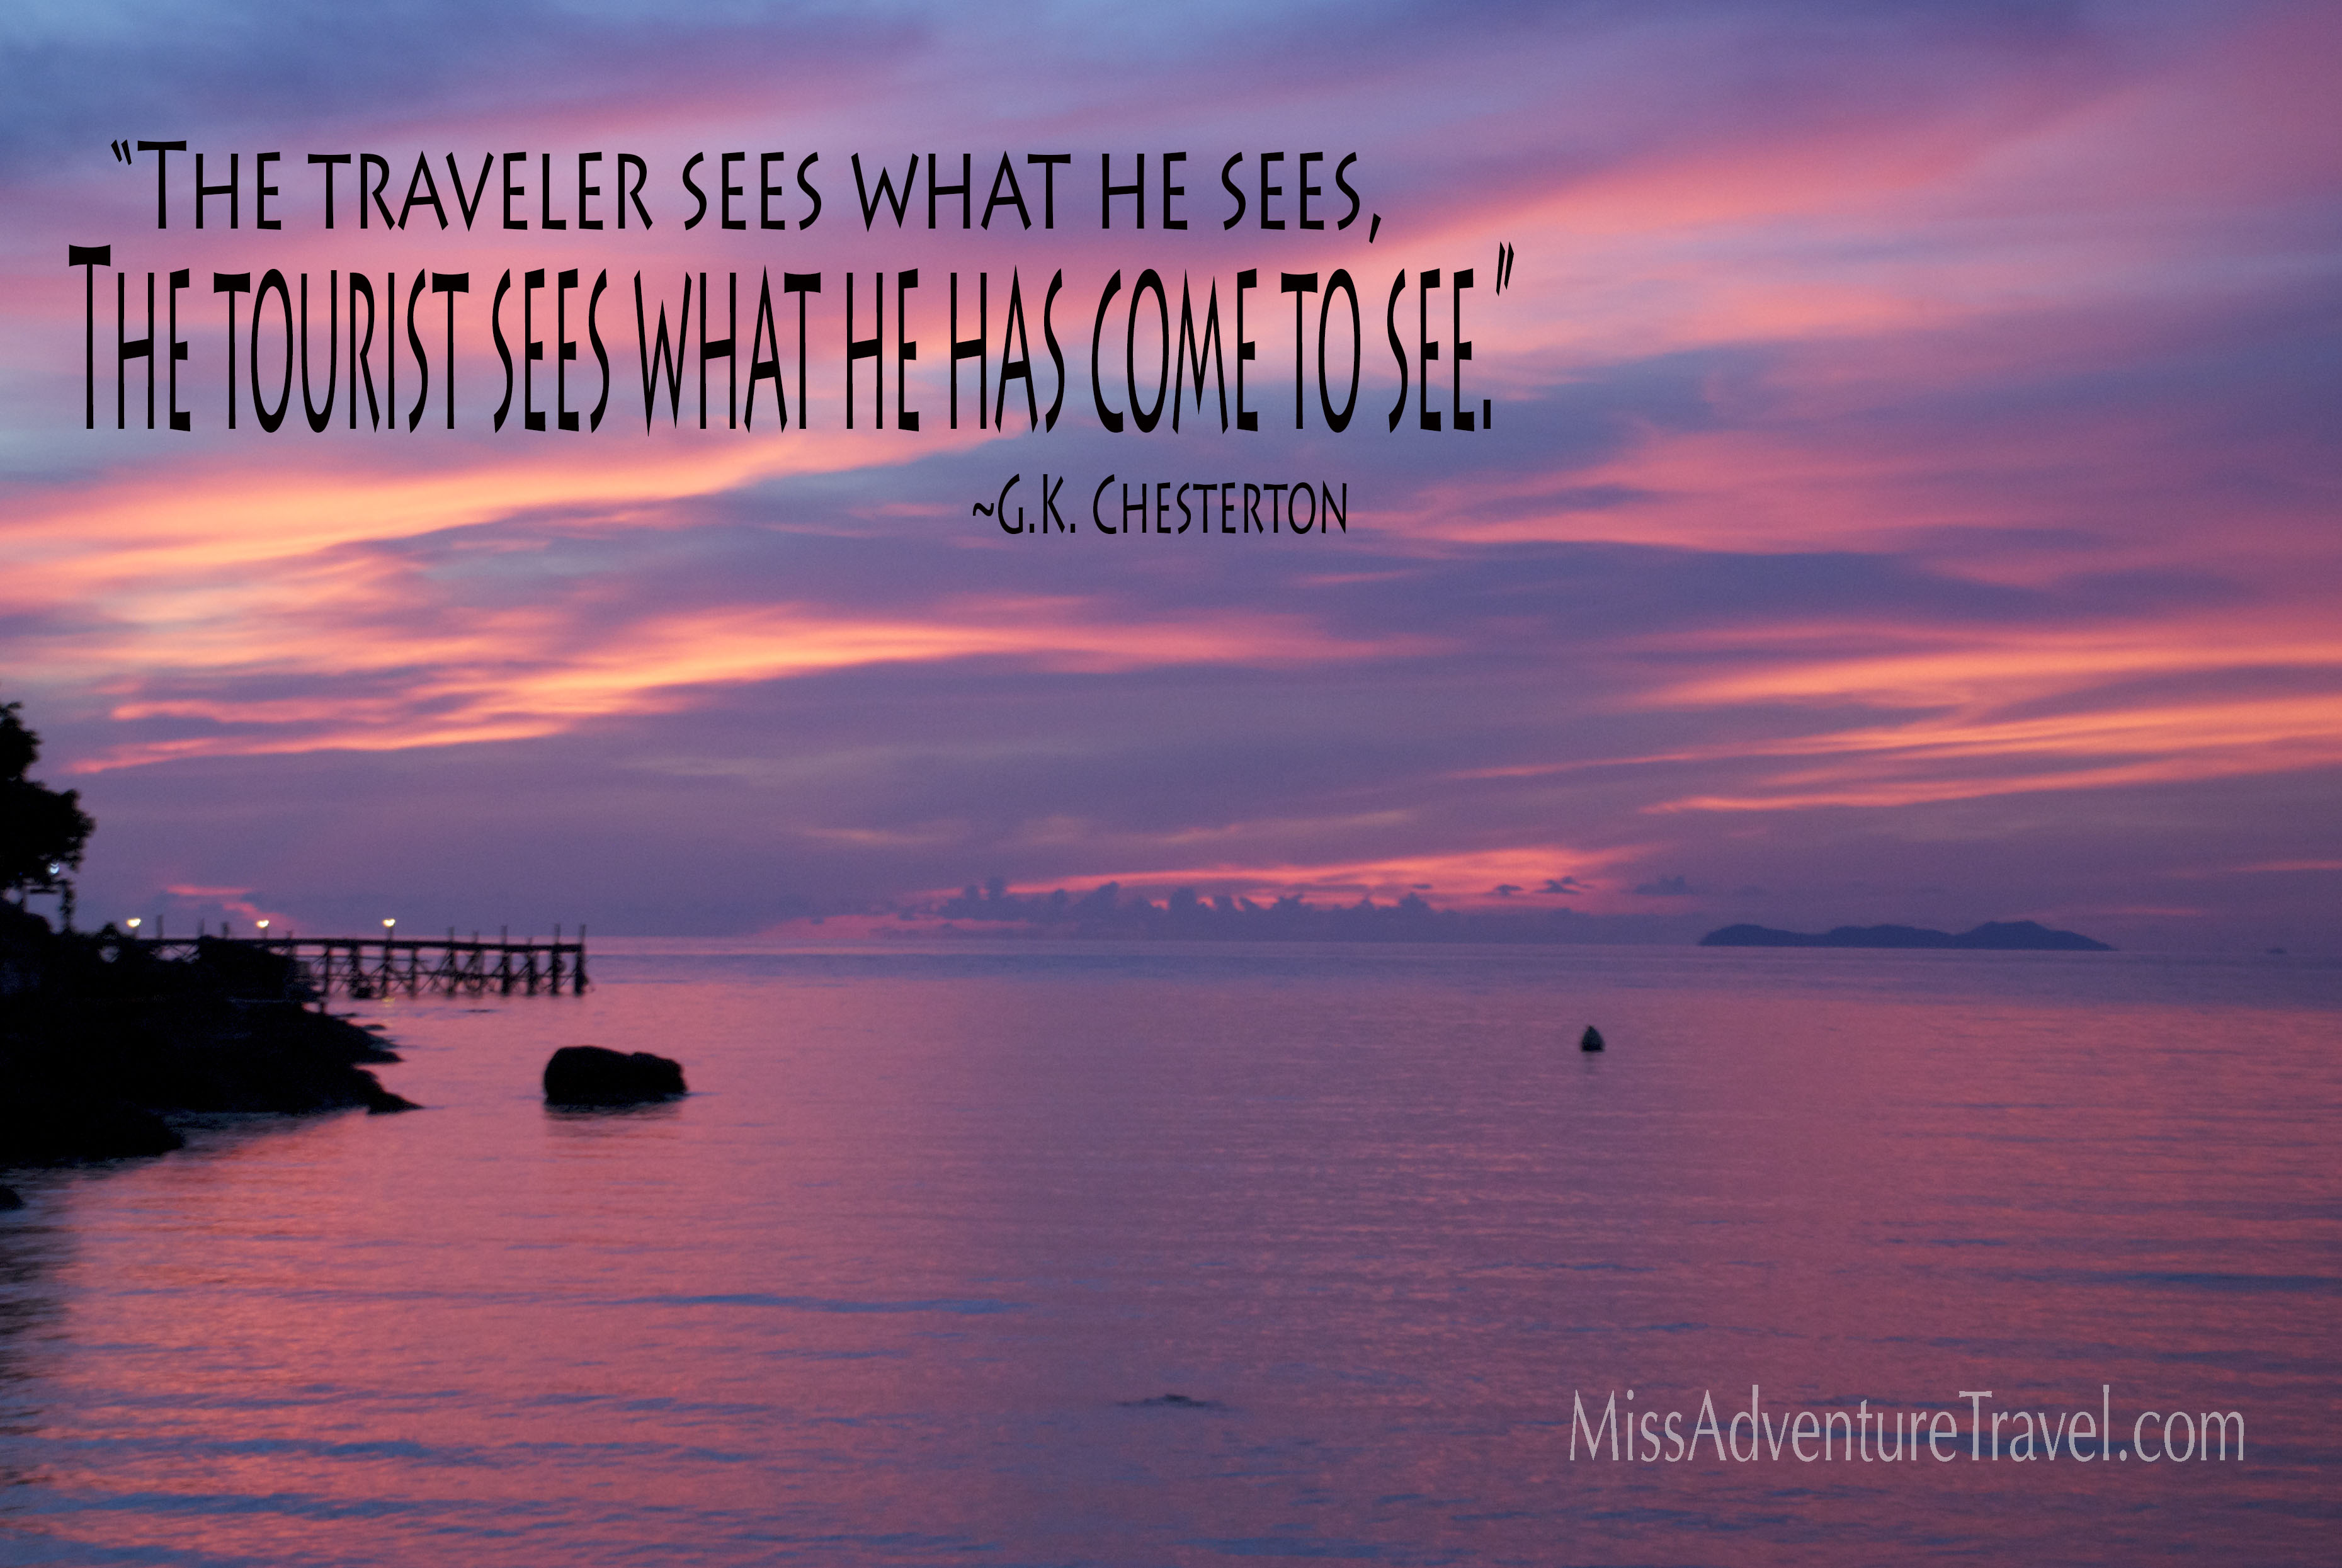 Travel Quotes - MissAdventure Travel